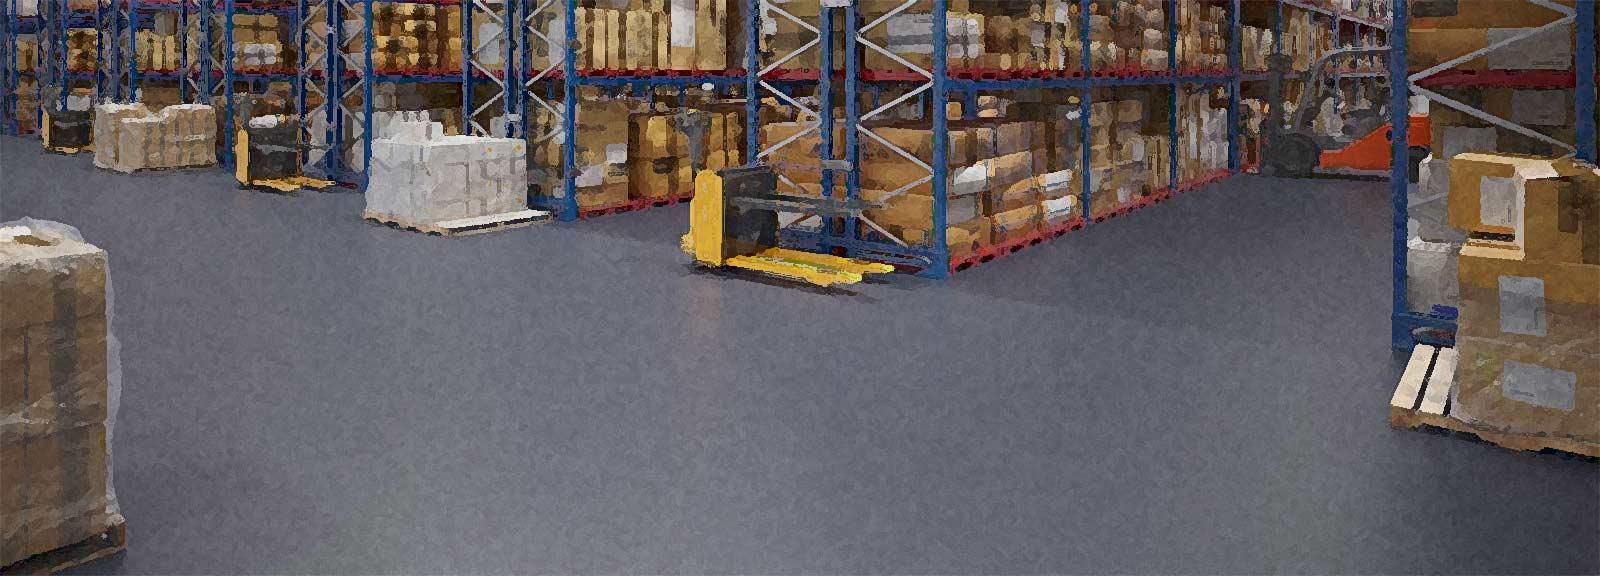 7 Reasons Why You Should Consider Interlocking Flooring Tiles